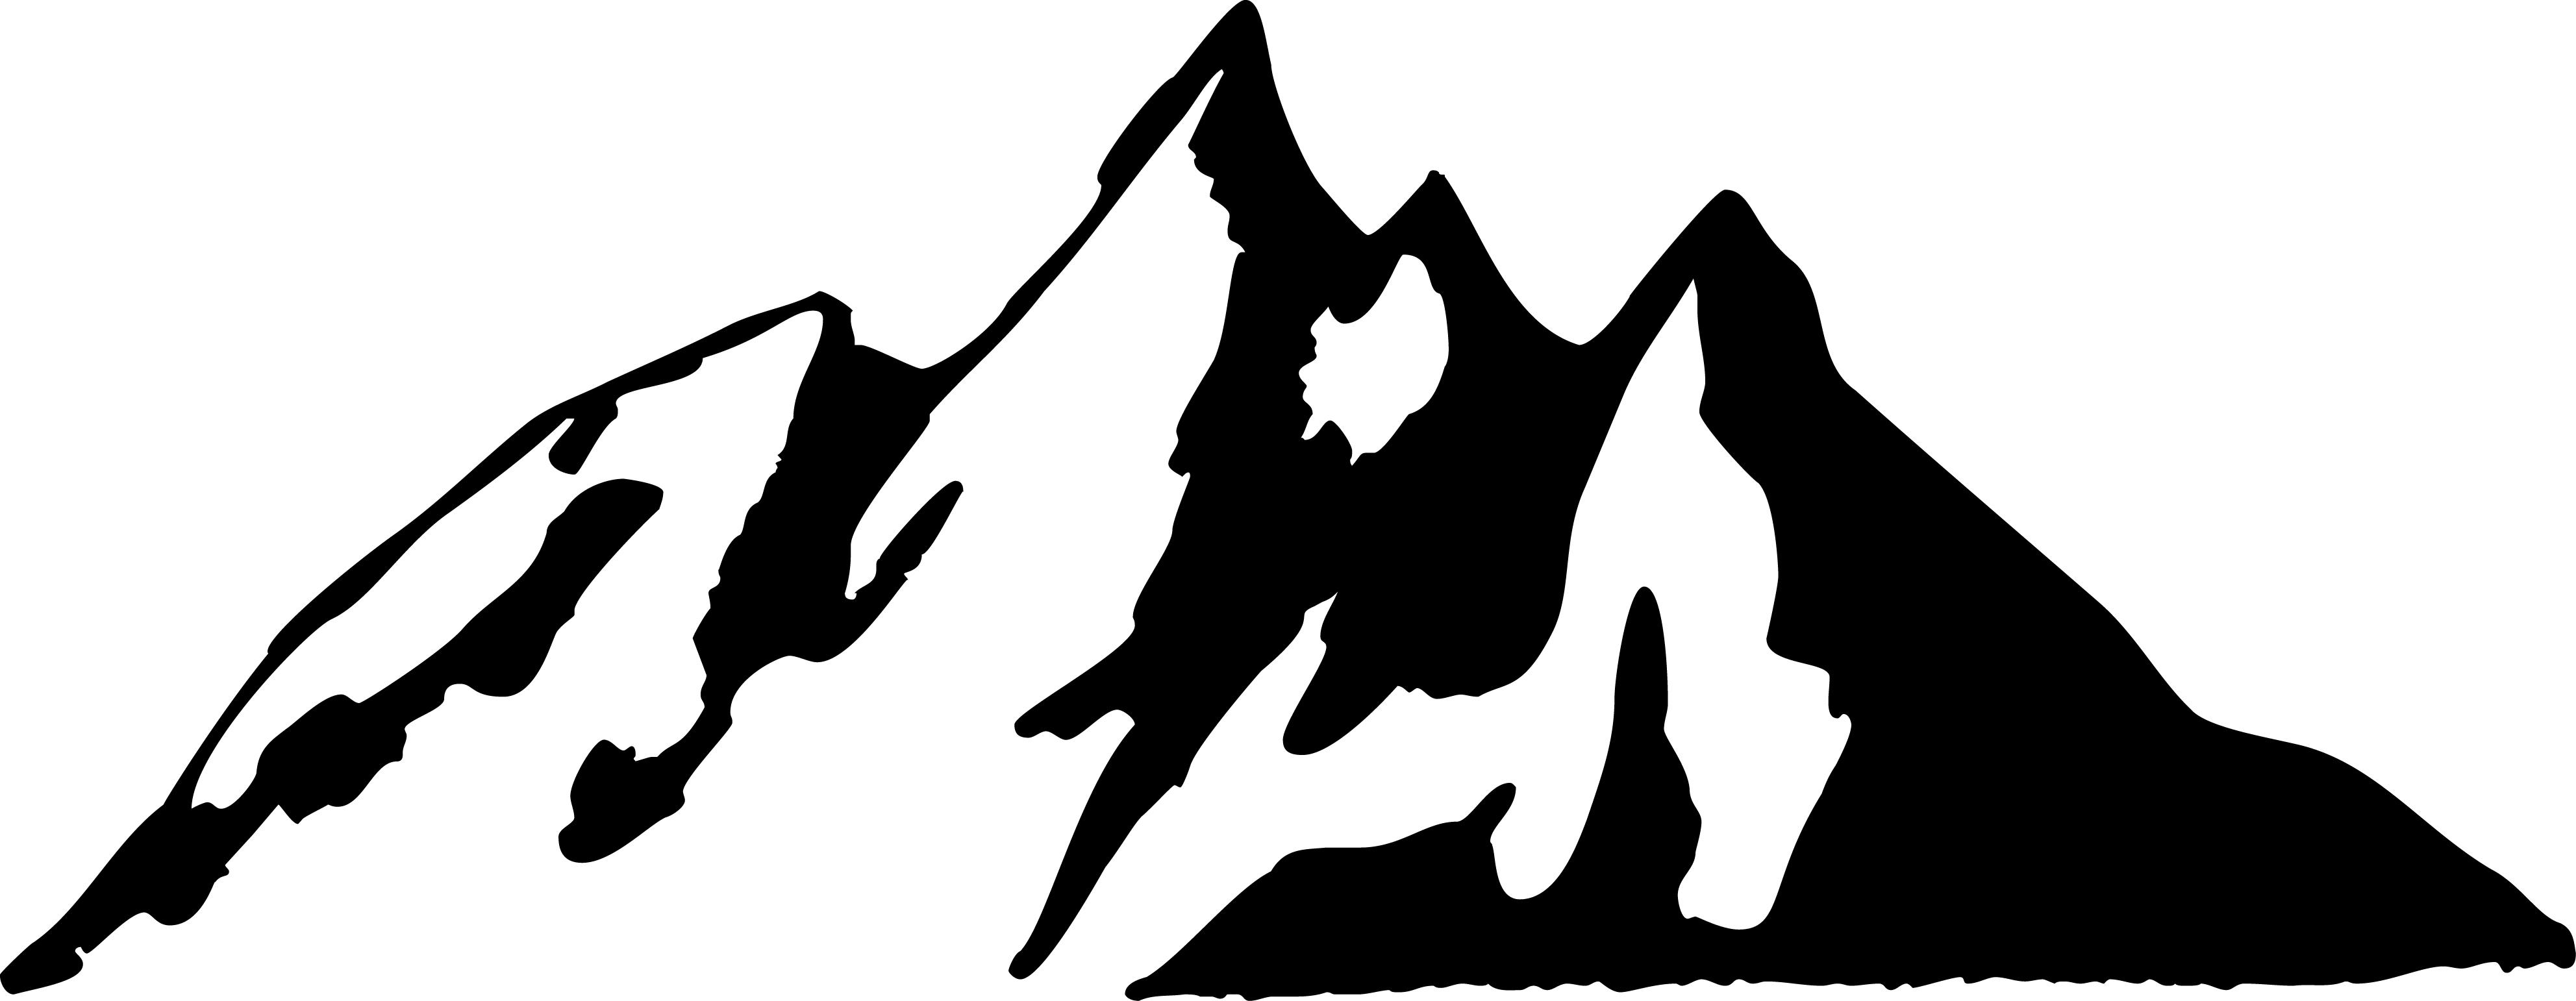 free photo mountain lineart top white mountain free download rh jooinn com mountain line art vector mountain line art vector